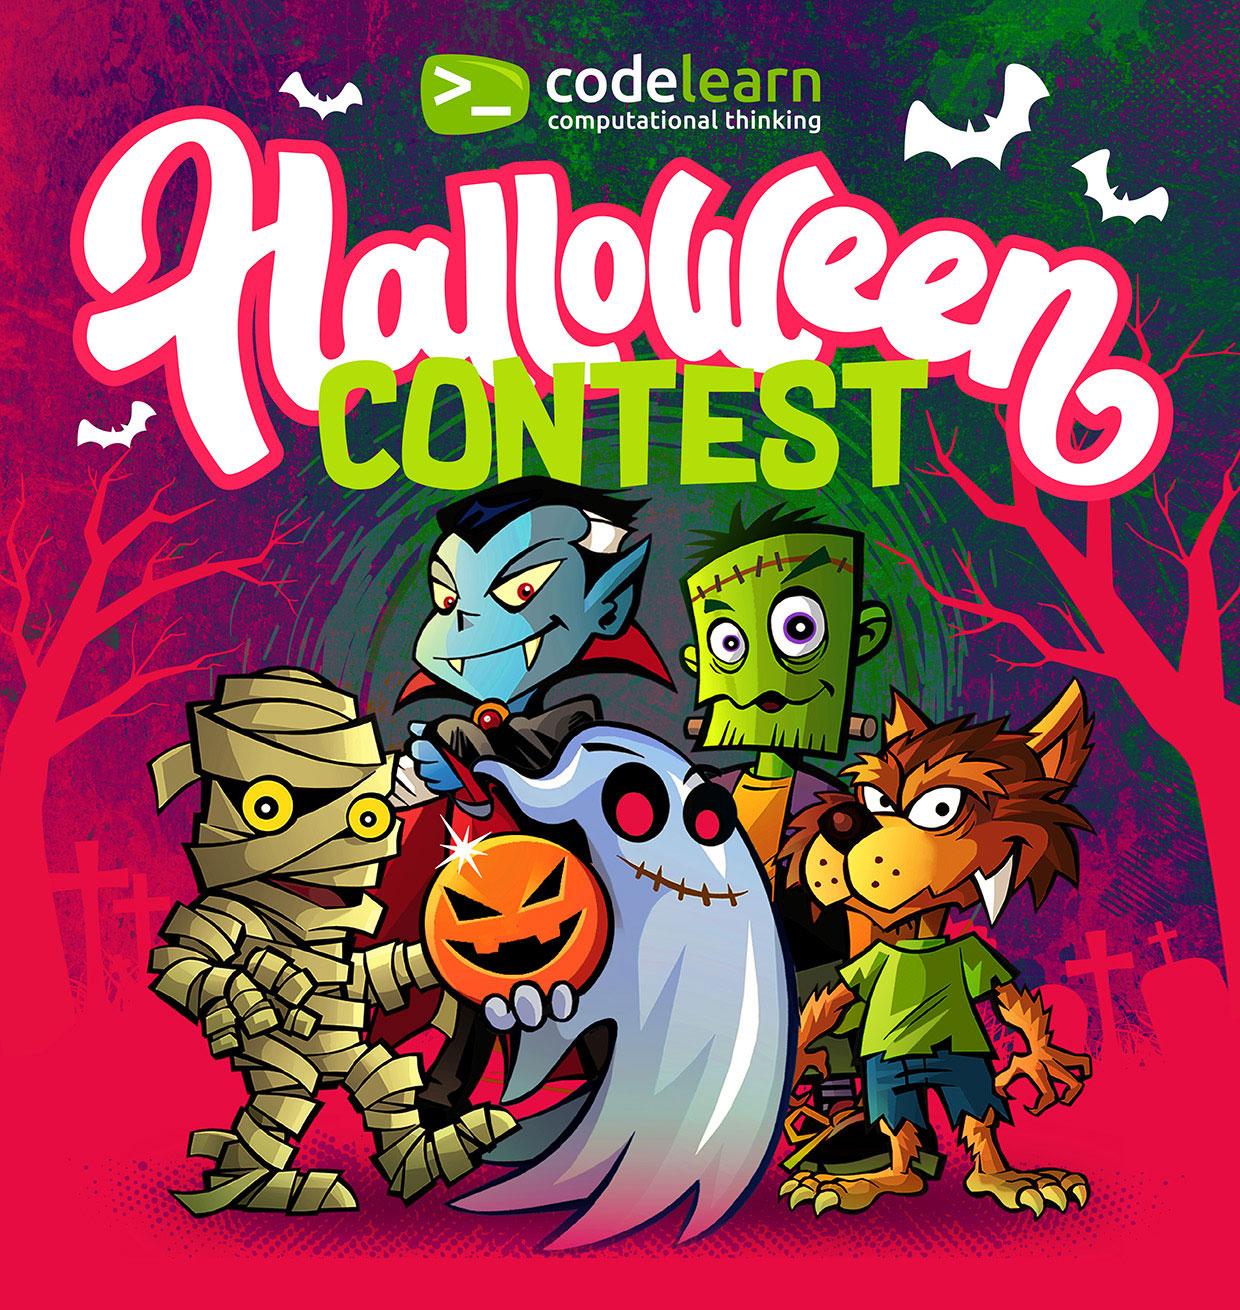 Codelearn's Halloween Contest